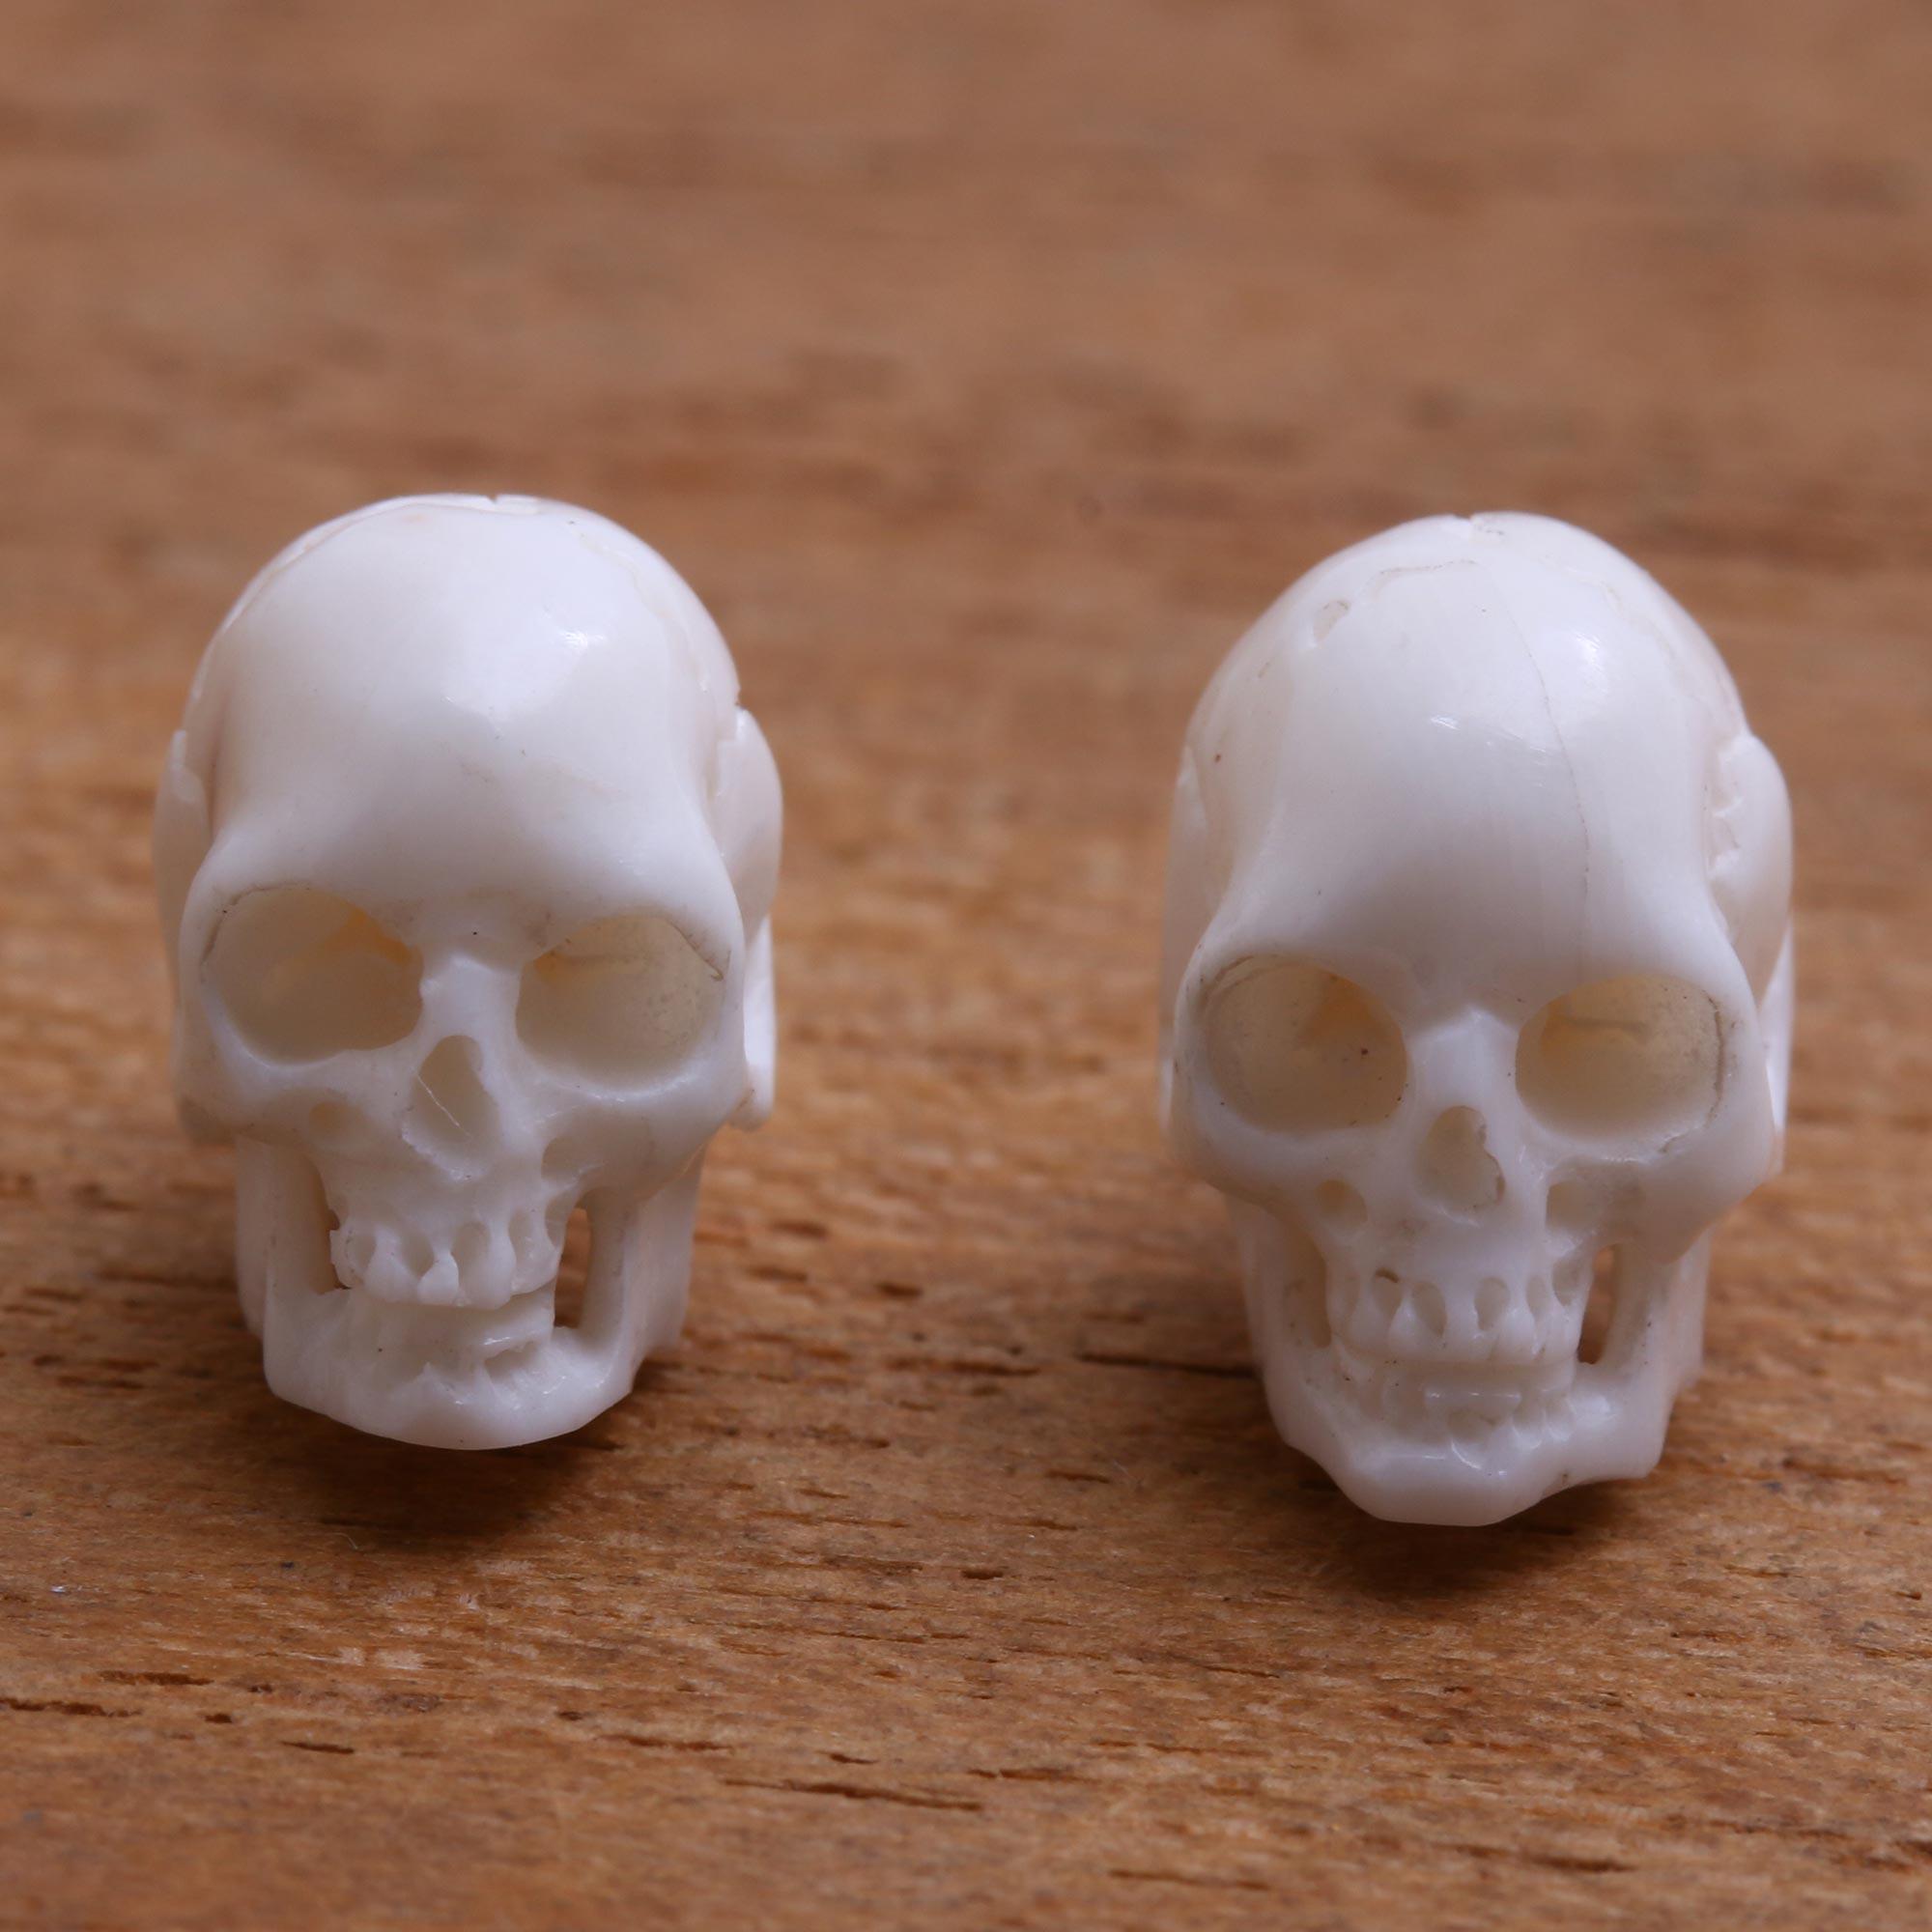 Skull Shaped Bone Stud Earrings Crafted In Bali Trunyan Skulls Novica